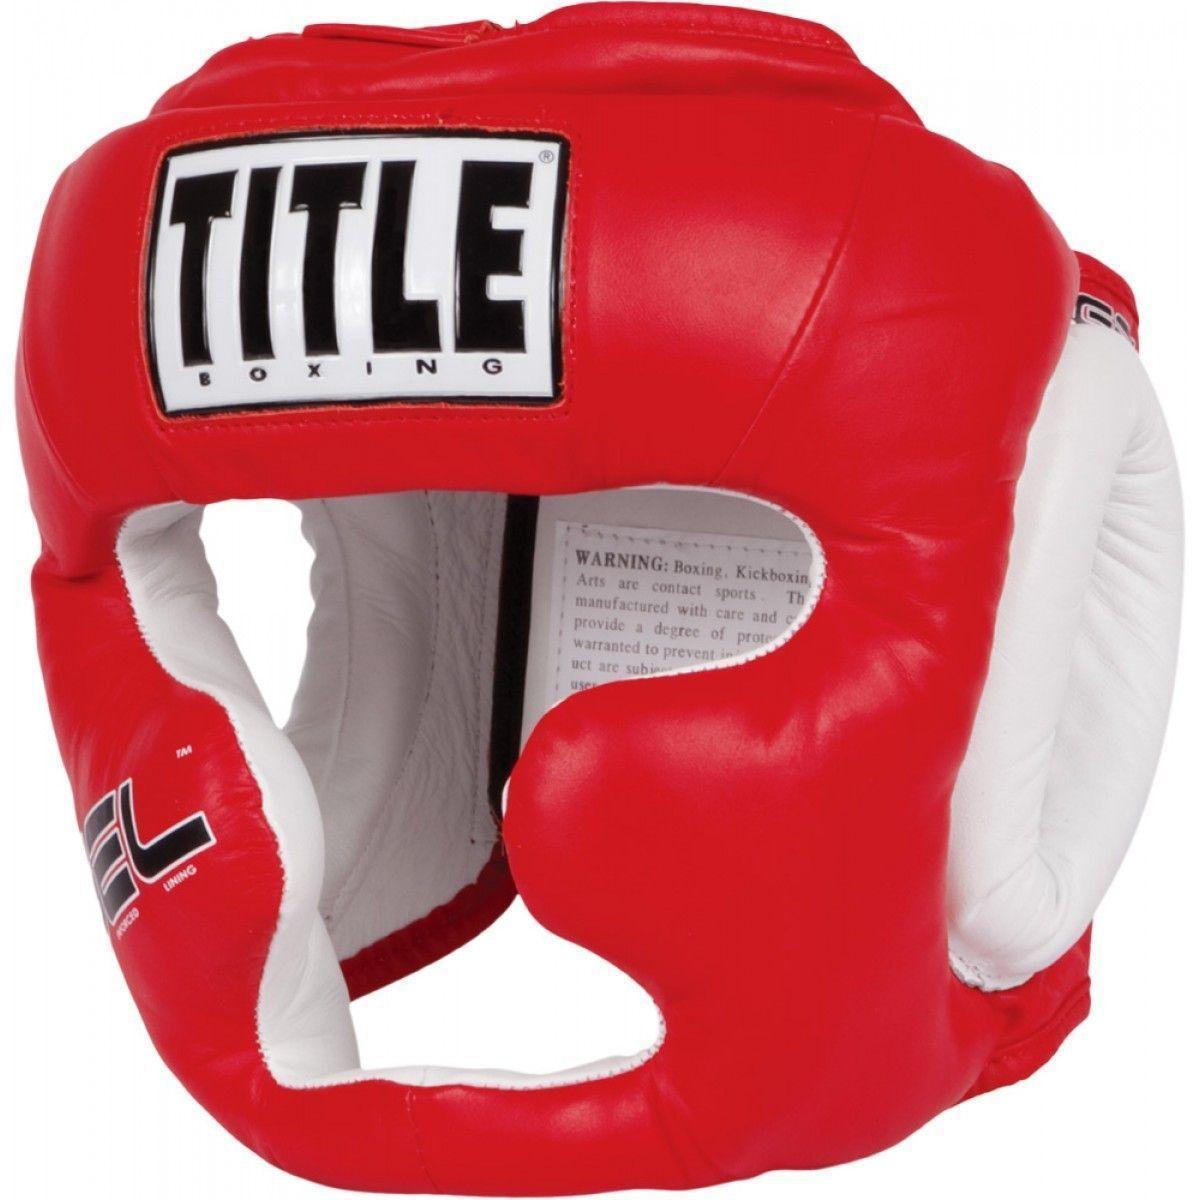 Шлем Title Gel World Full-Face Training Headgear (красный)